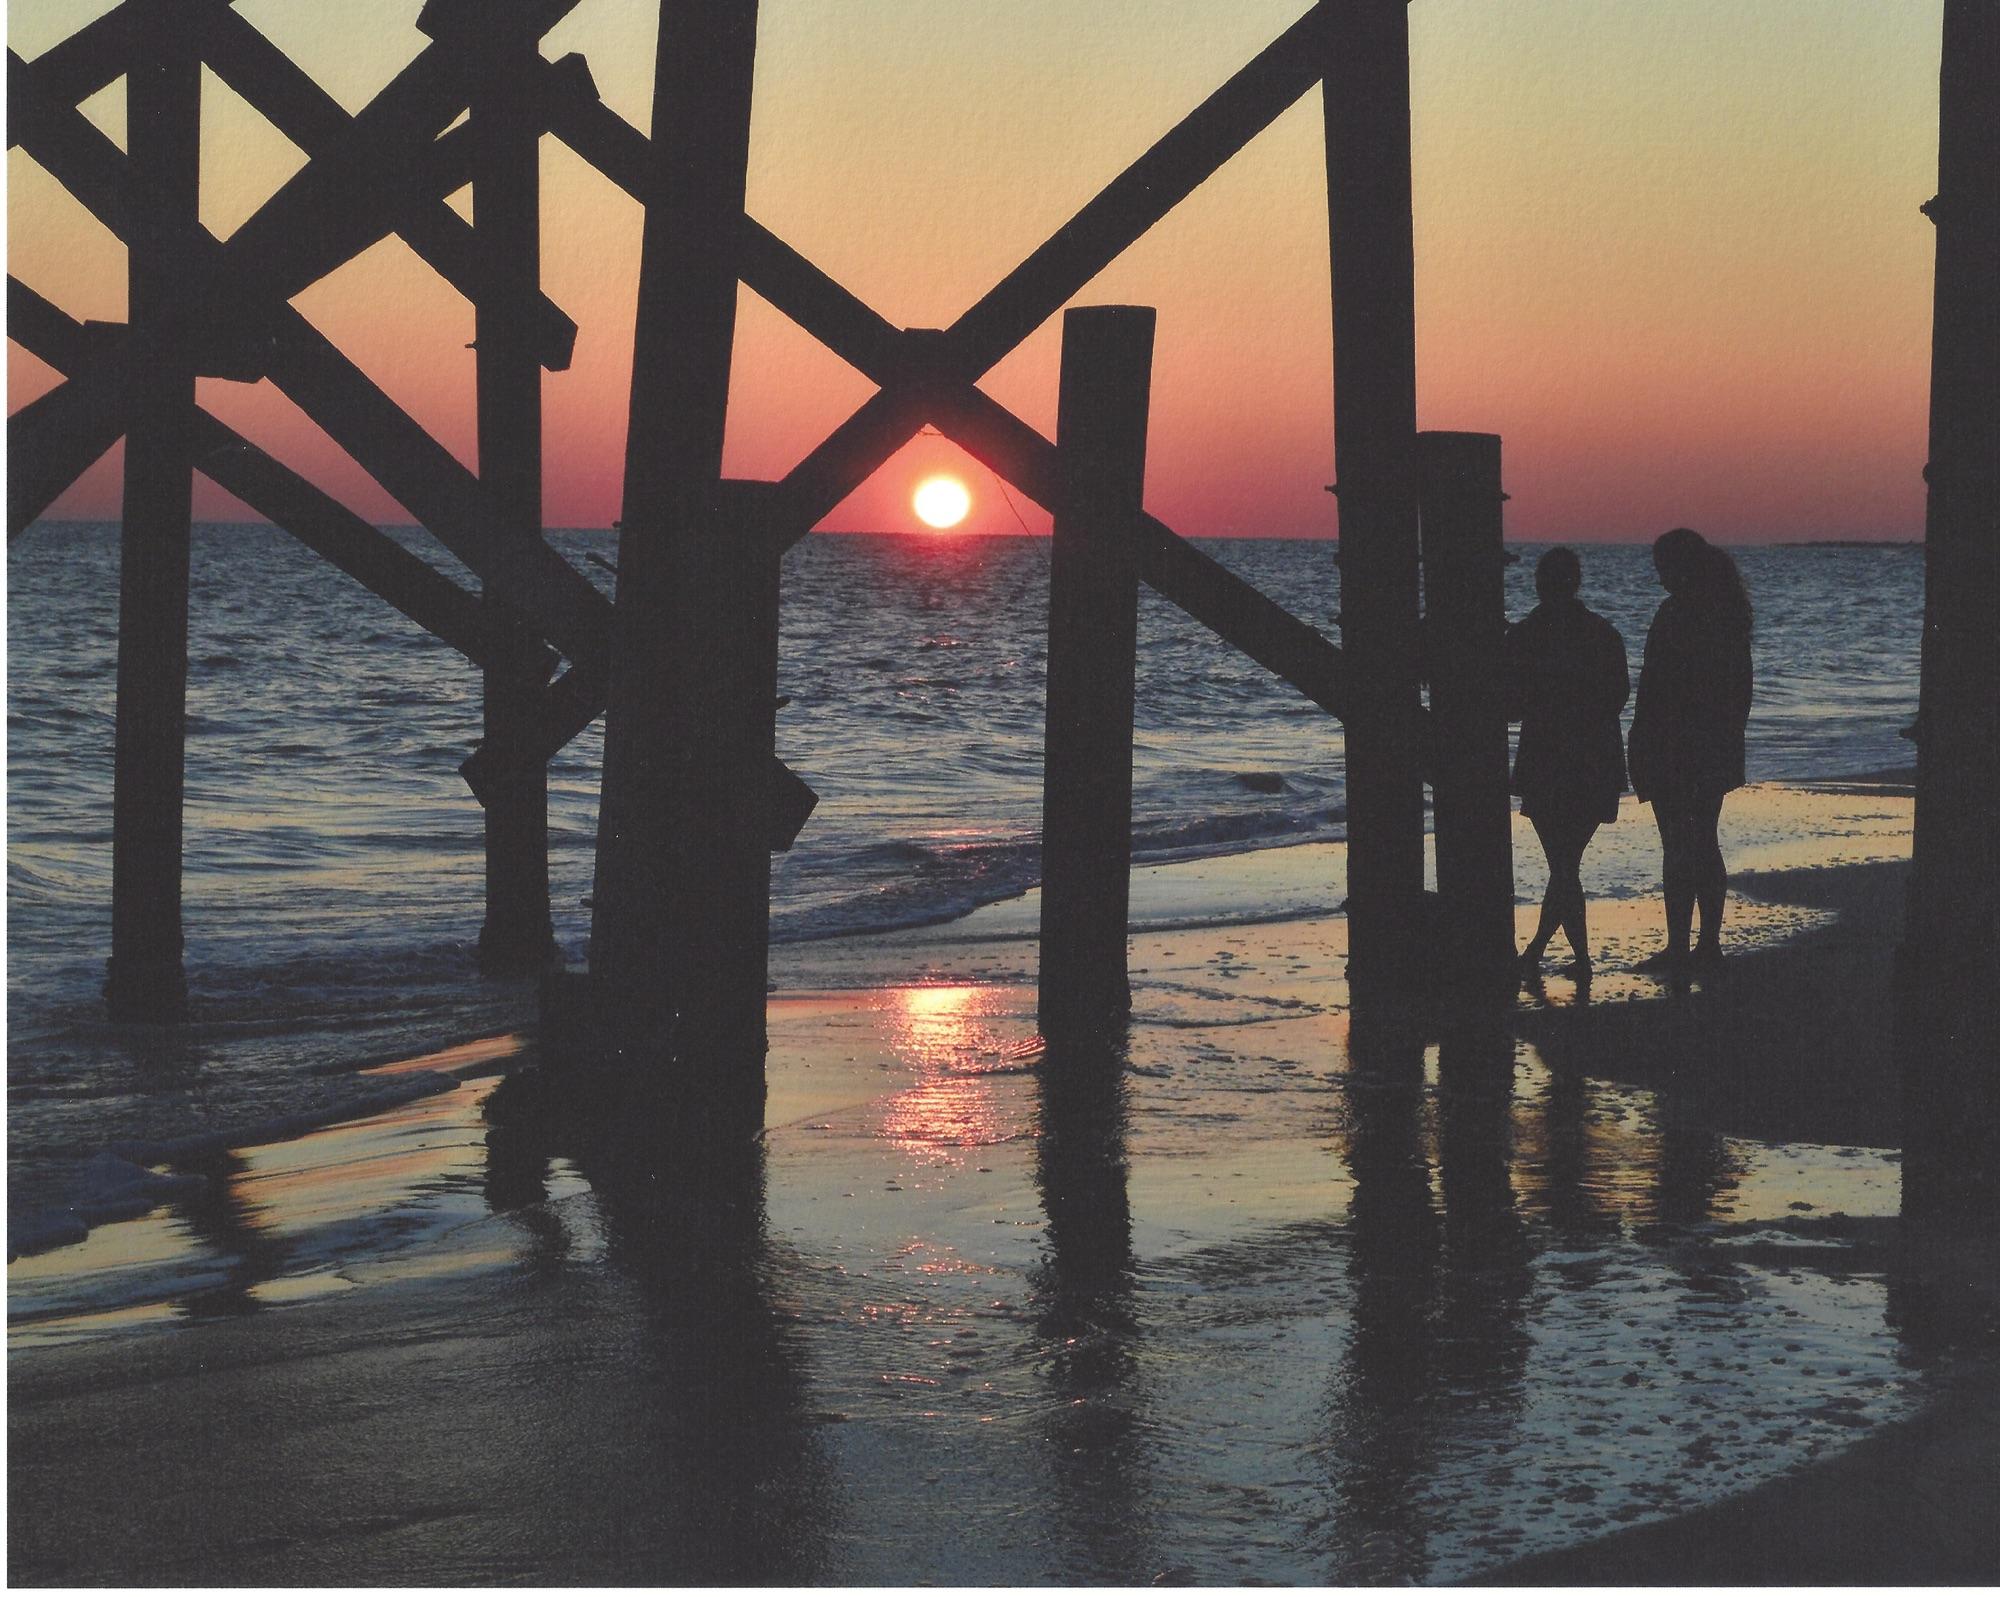 Photo by Kathy Bouzard Mexico Beach 2016 Photo Contest